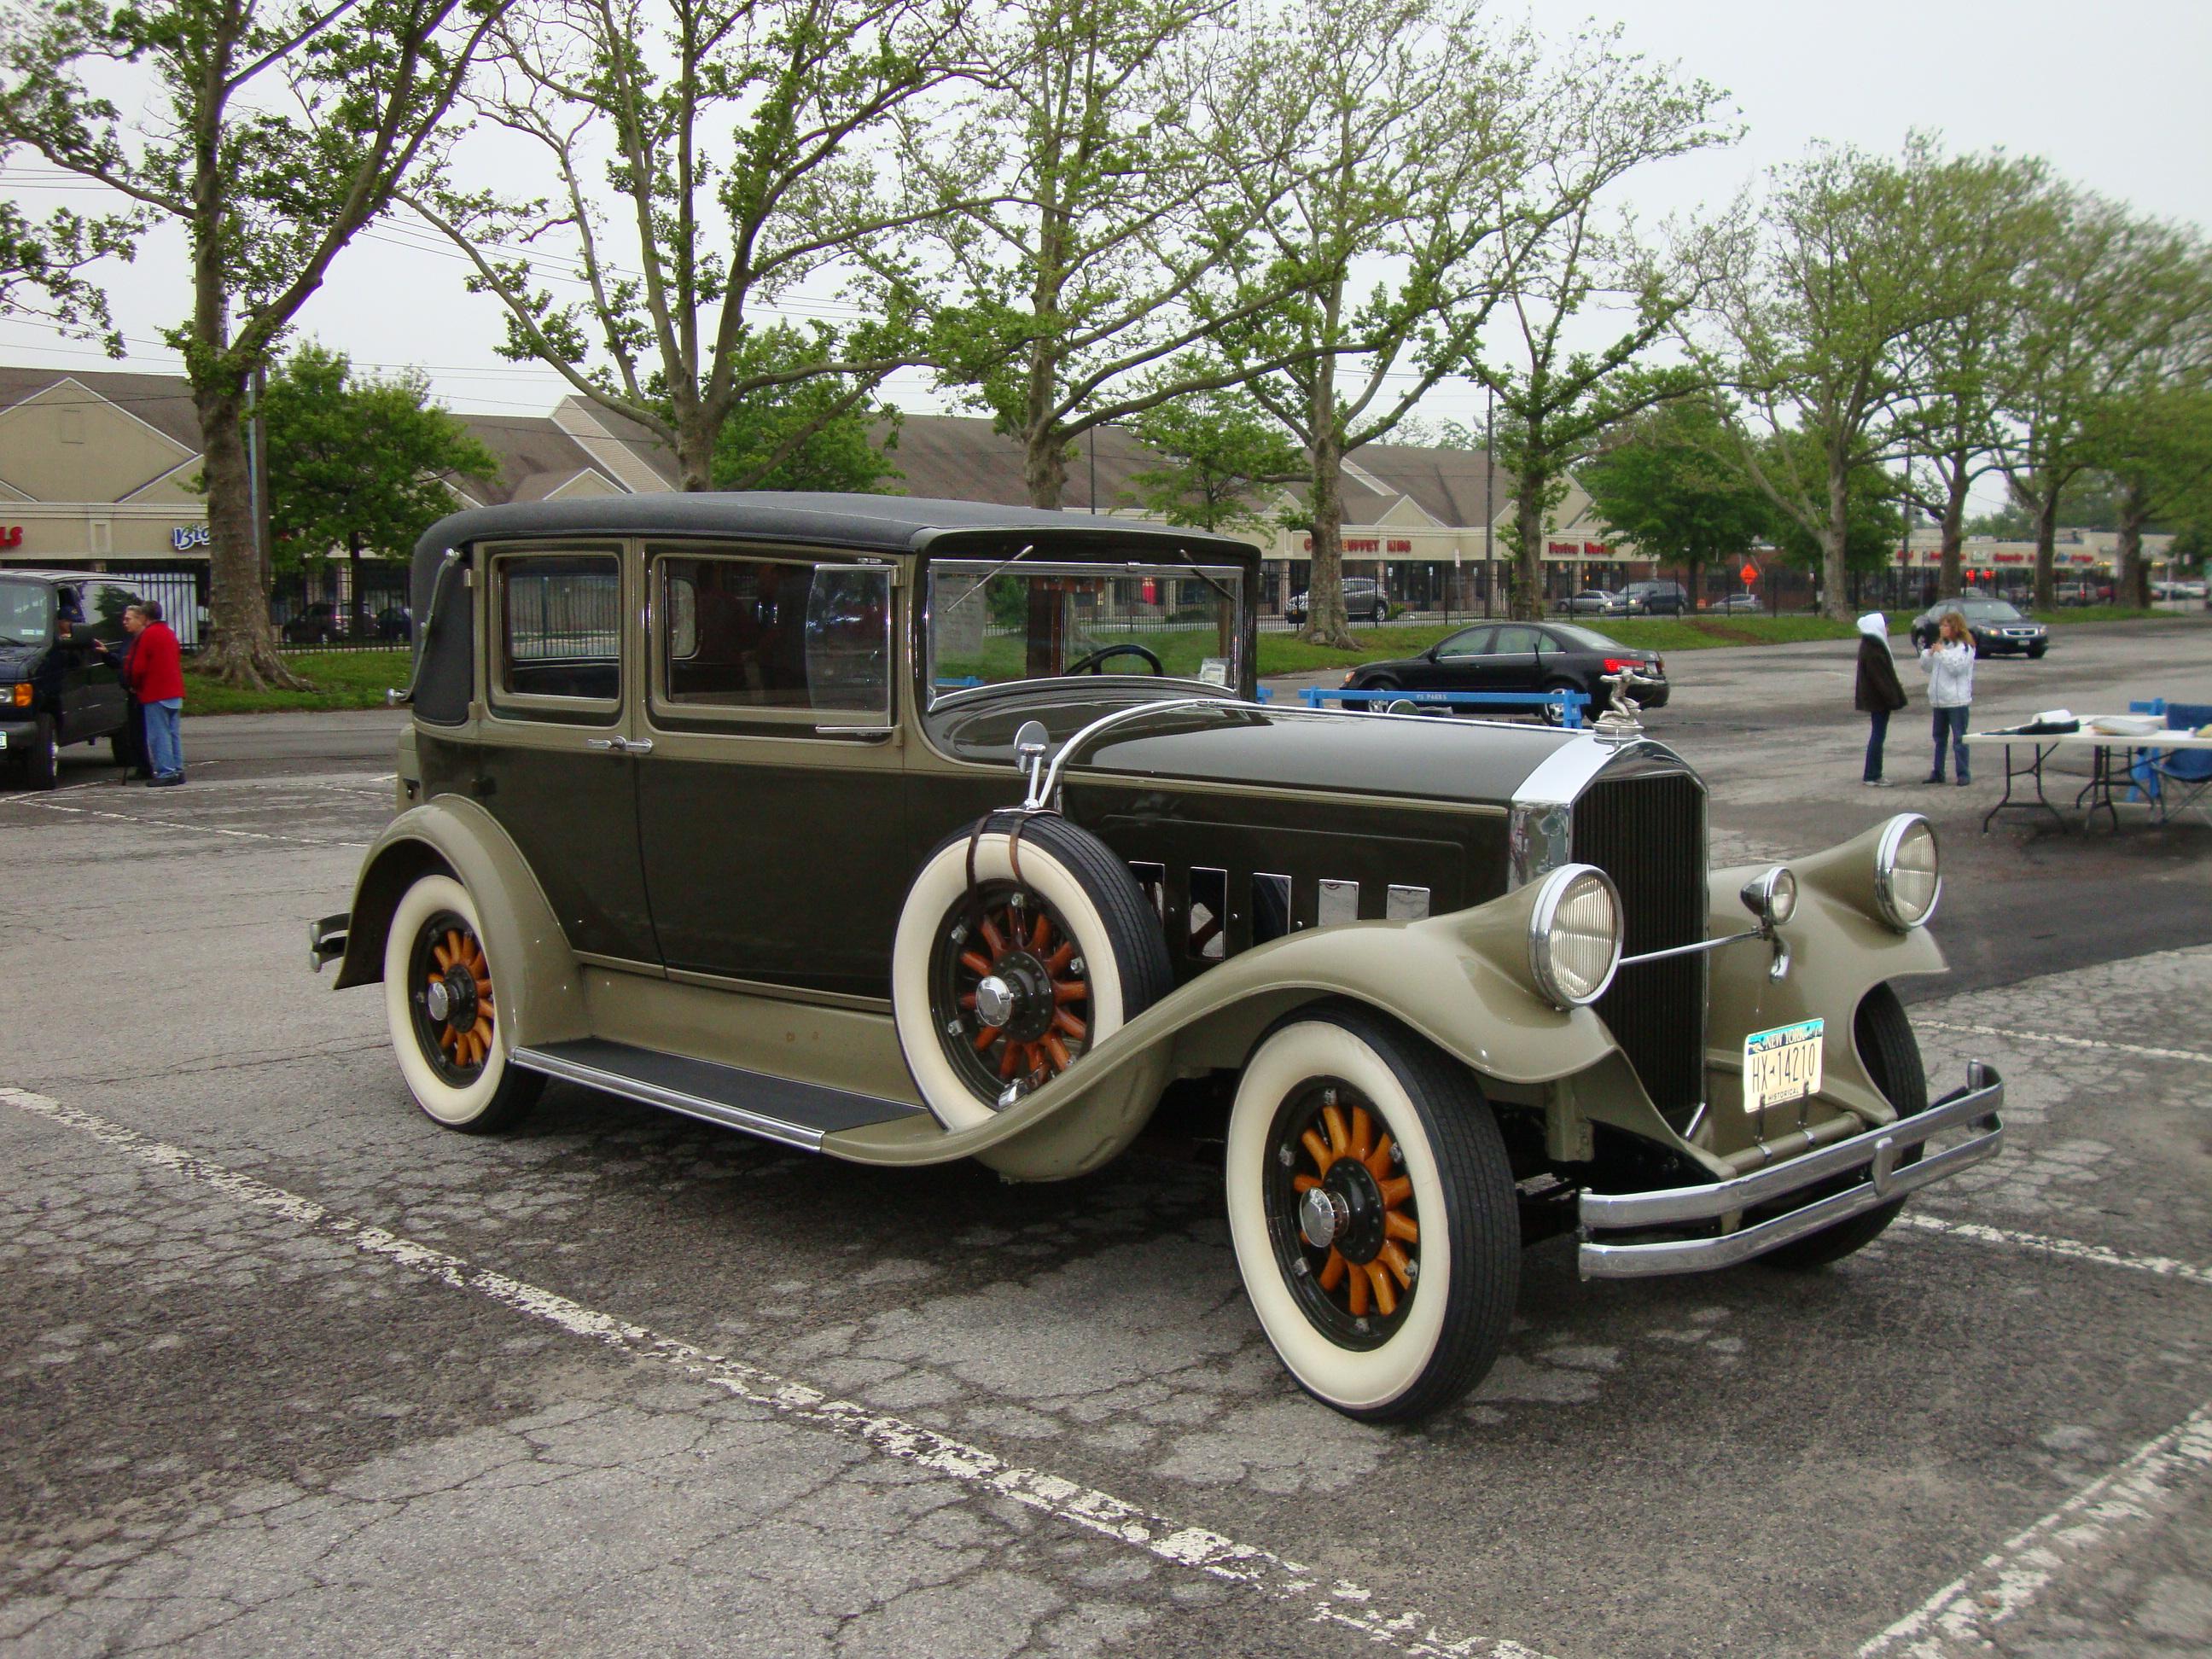 Limousine For Sale >> File:1929 Pierce Arrow.jpg - Wikimedia Commons